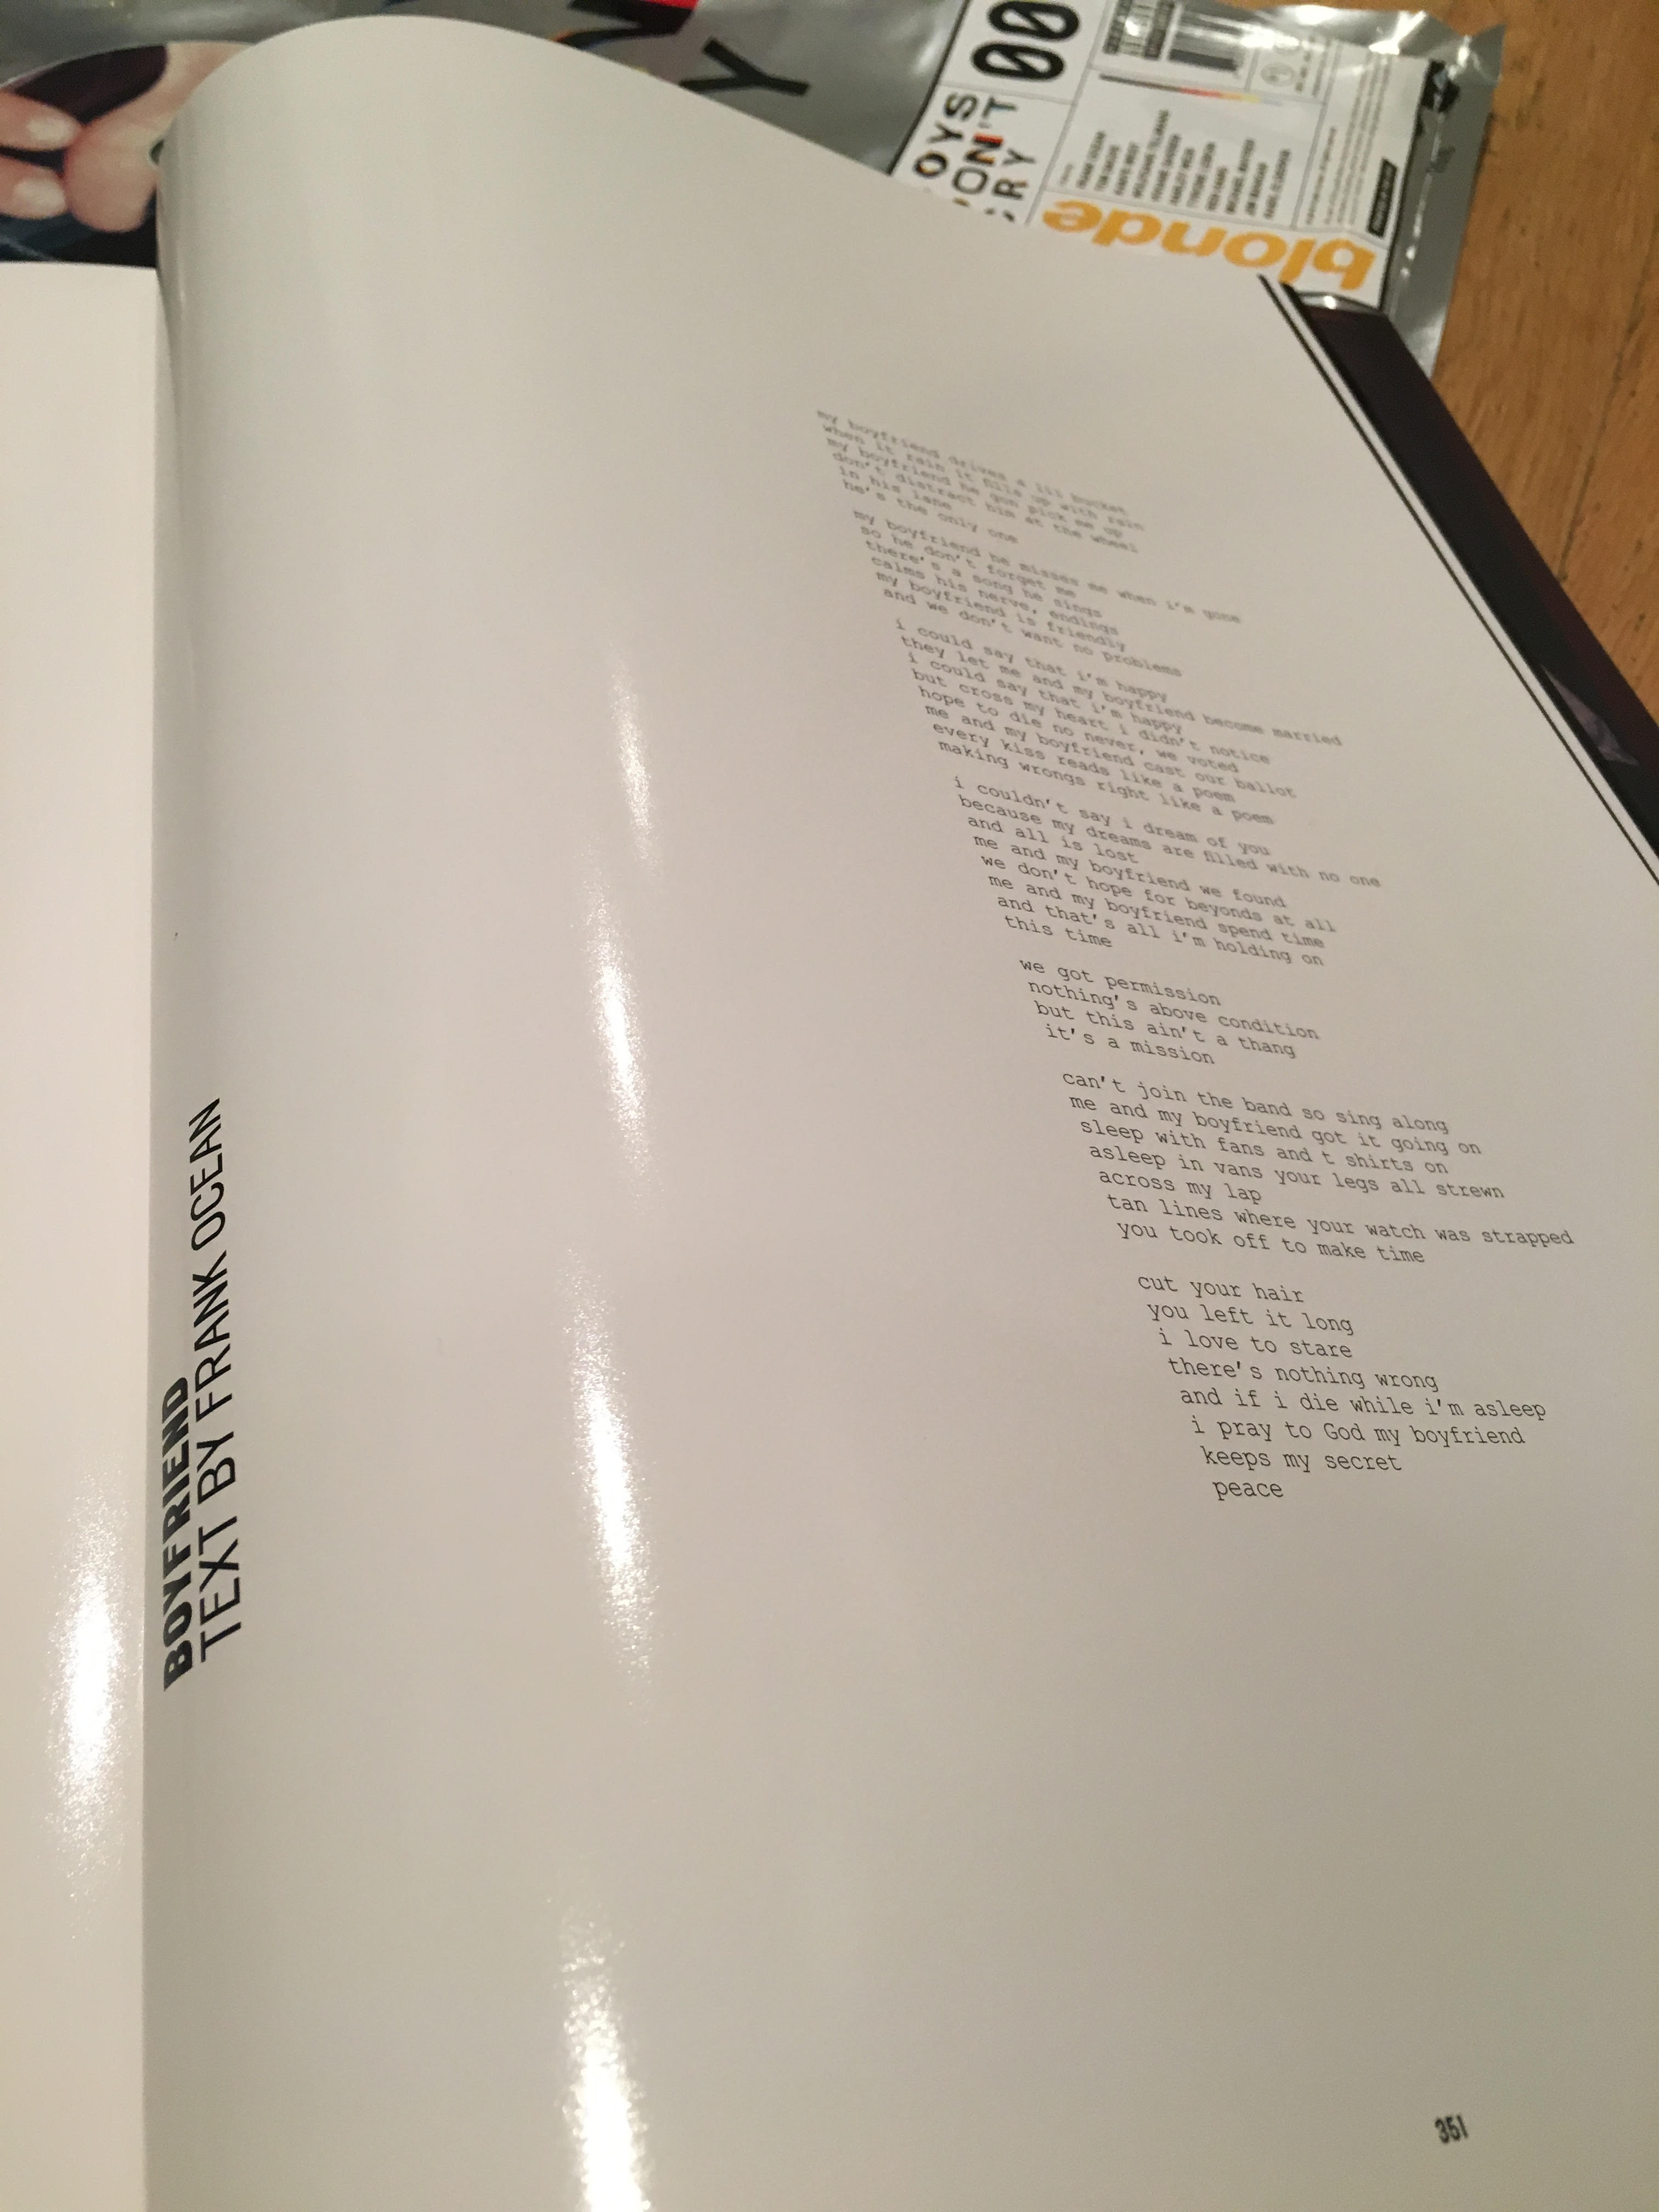 Here's a Look Inside Frank Ocean's 'Boys Don't Cry' Zine news